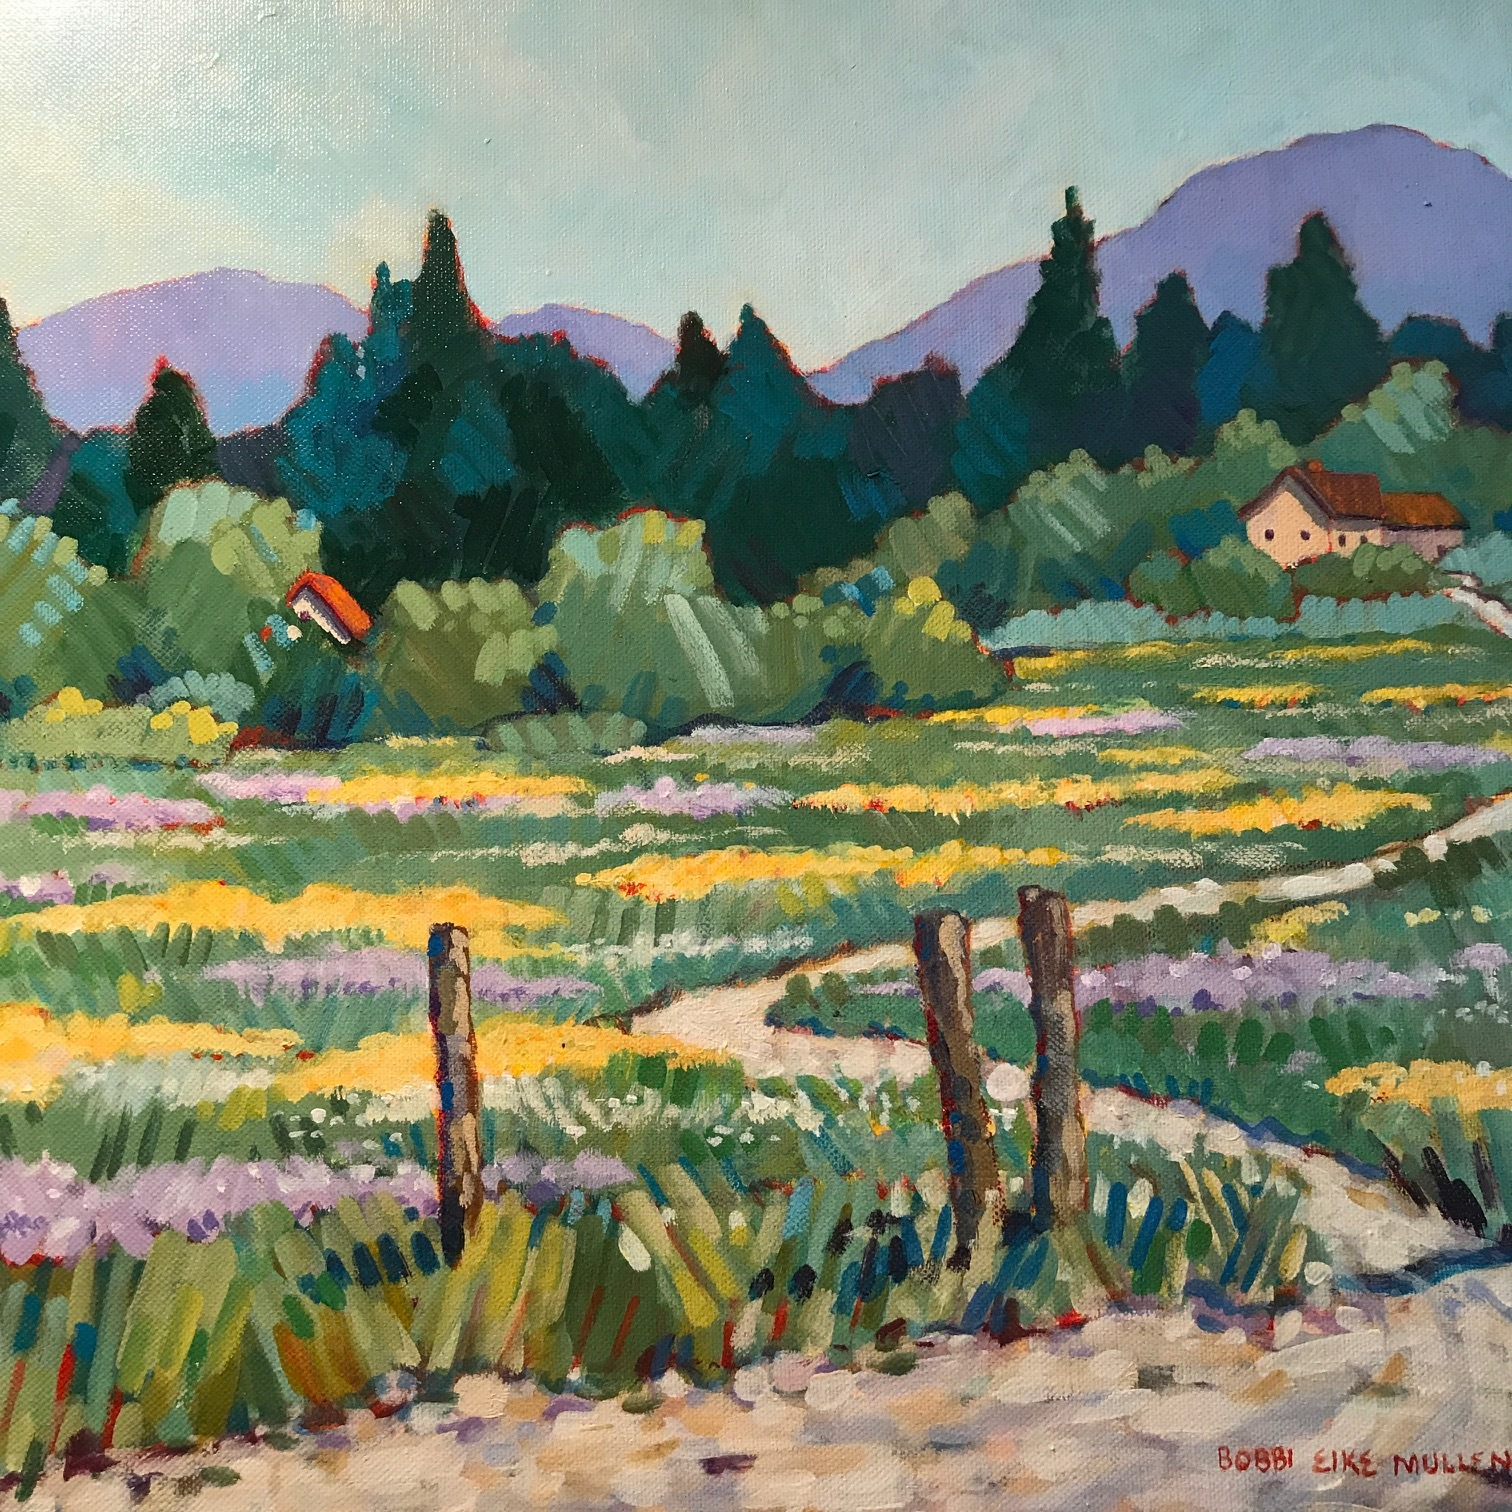 Bobbie Eike Mullen, landscape